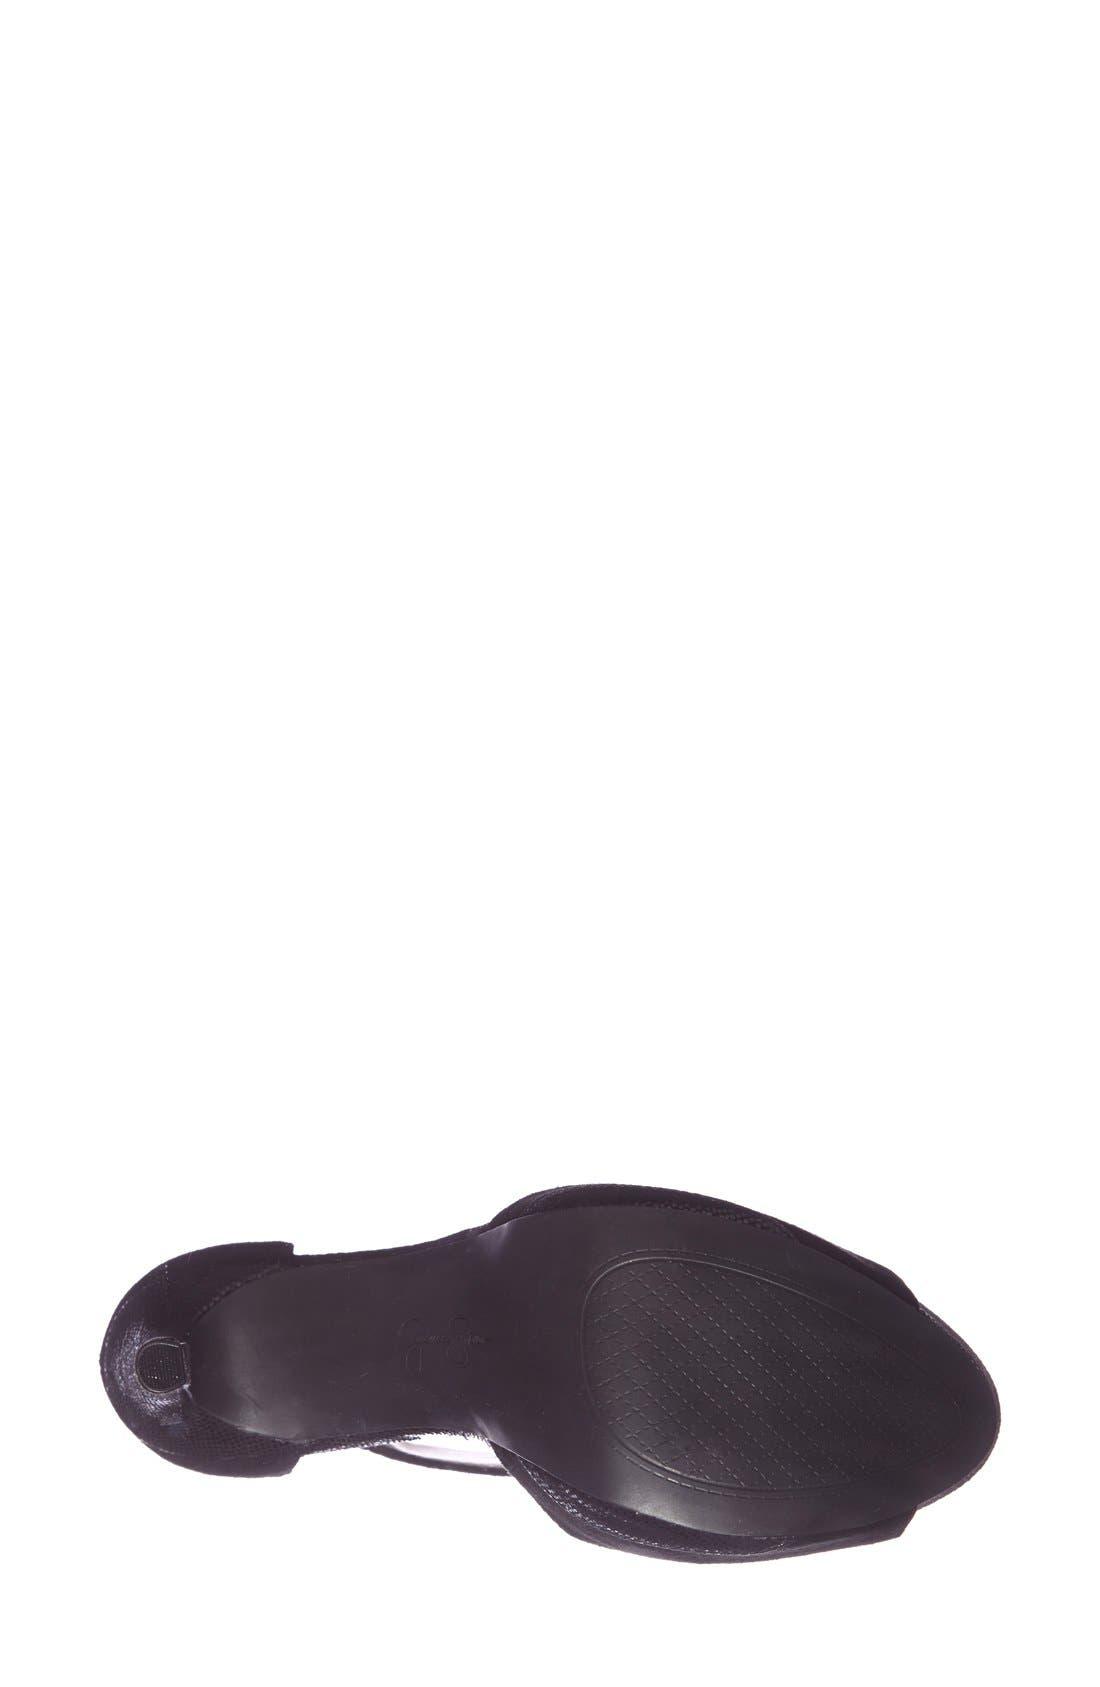 Alternate Image 4  - Jessica Simpson 'Carideo' Platform Sandal (Women)